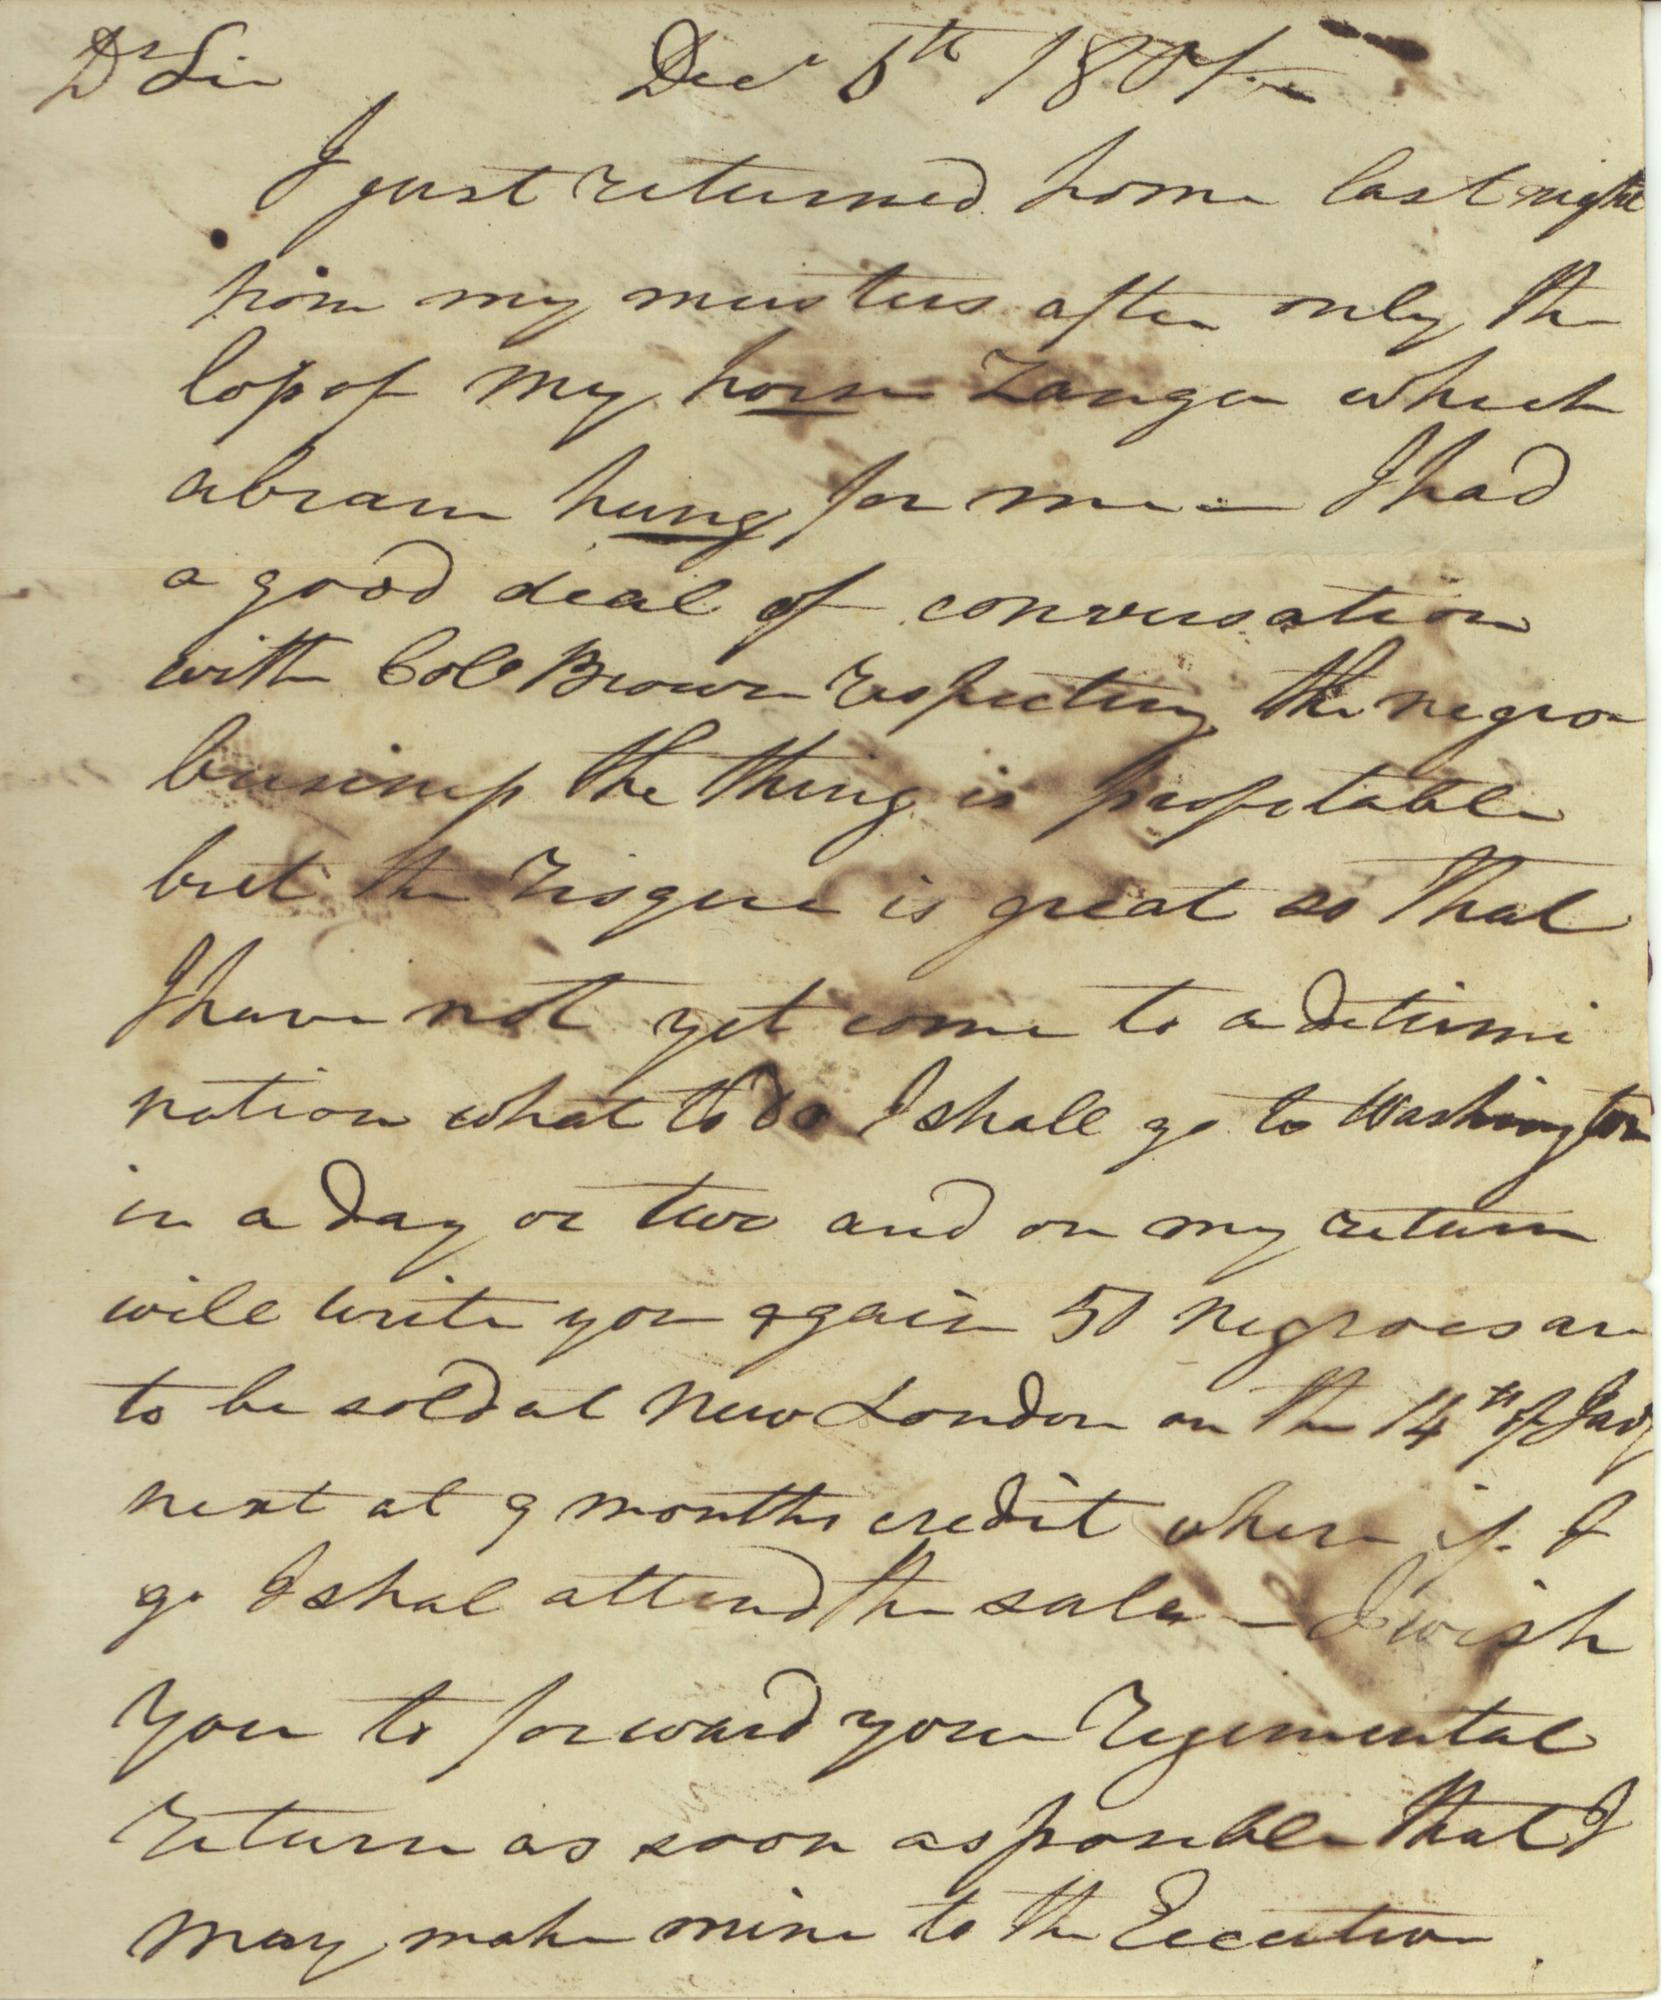 Ms1997_002_SmithfieldPreston_Letter_1801_1205a.jpg